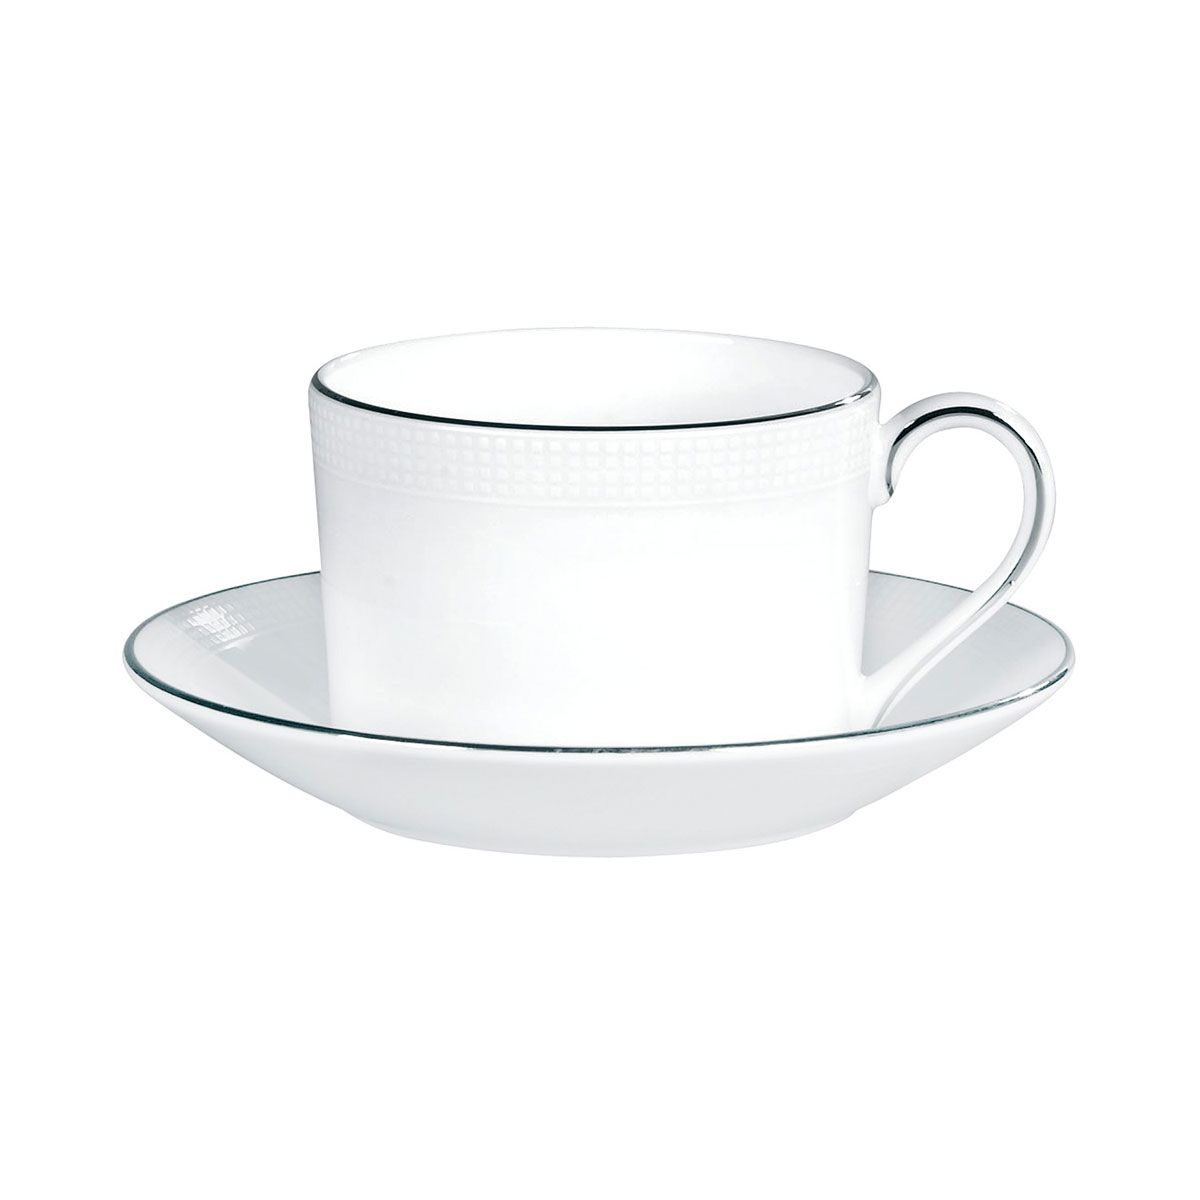 Vera Wang Wedgwood Blanc Sur Blanc Teacup and Saucer